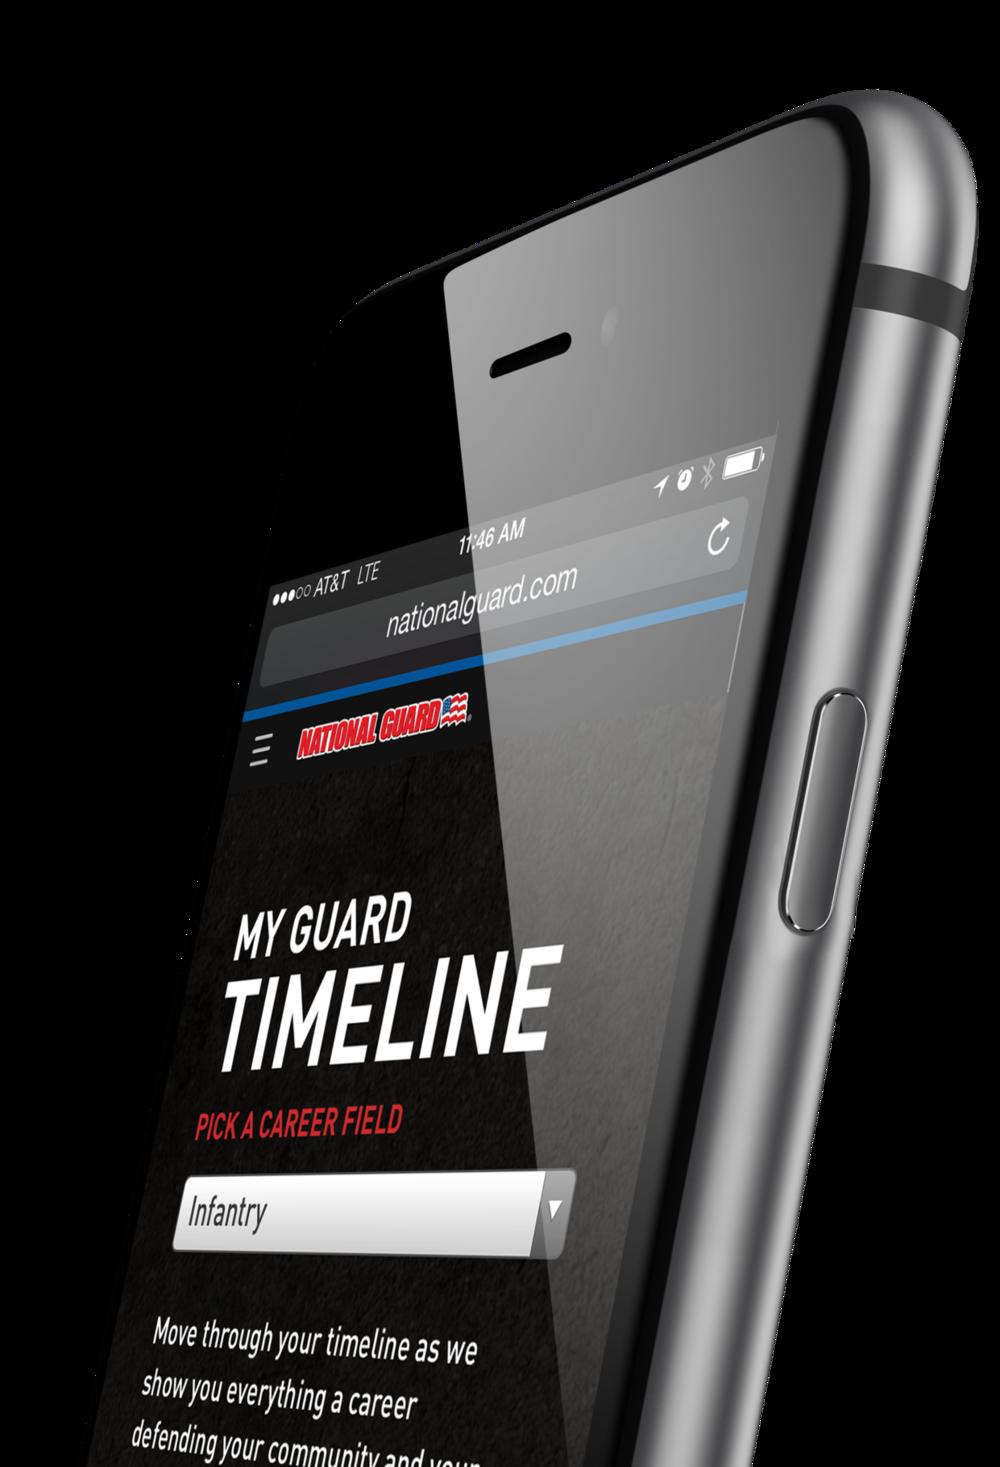 My Guard Timeline